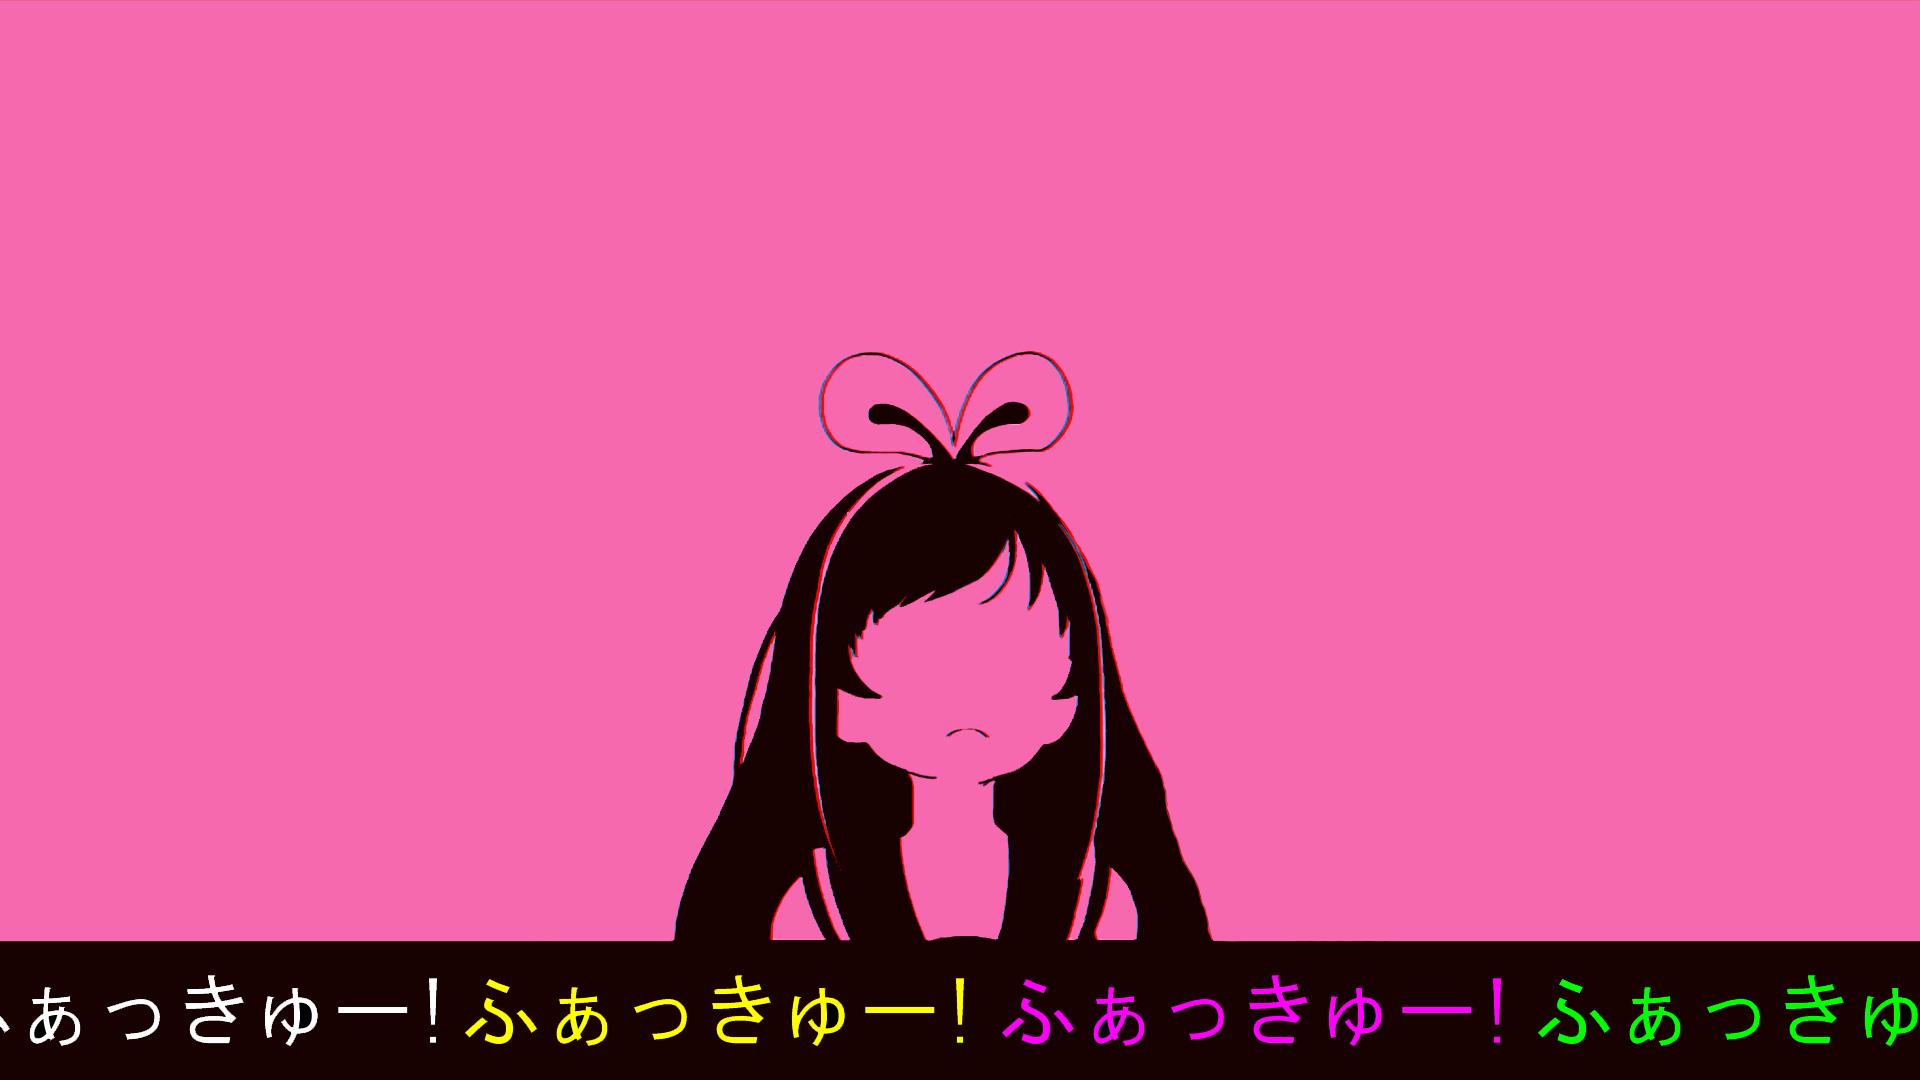 Wallpaper Kizuna Ai Simple Background Anime Girls Fuck